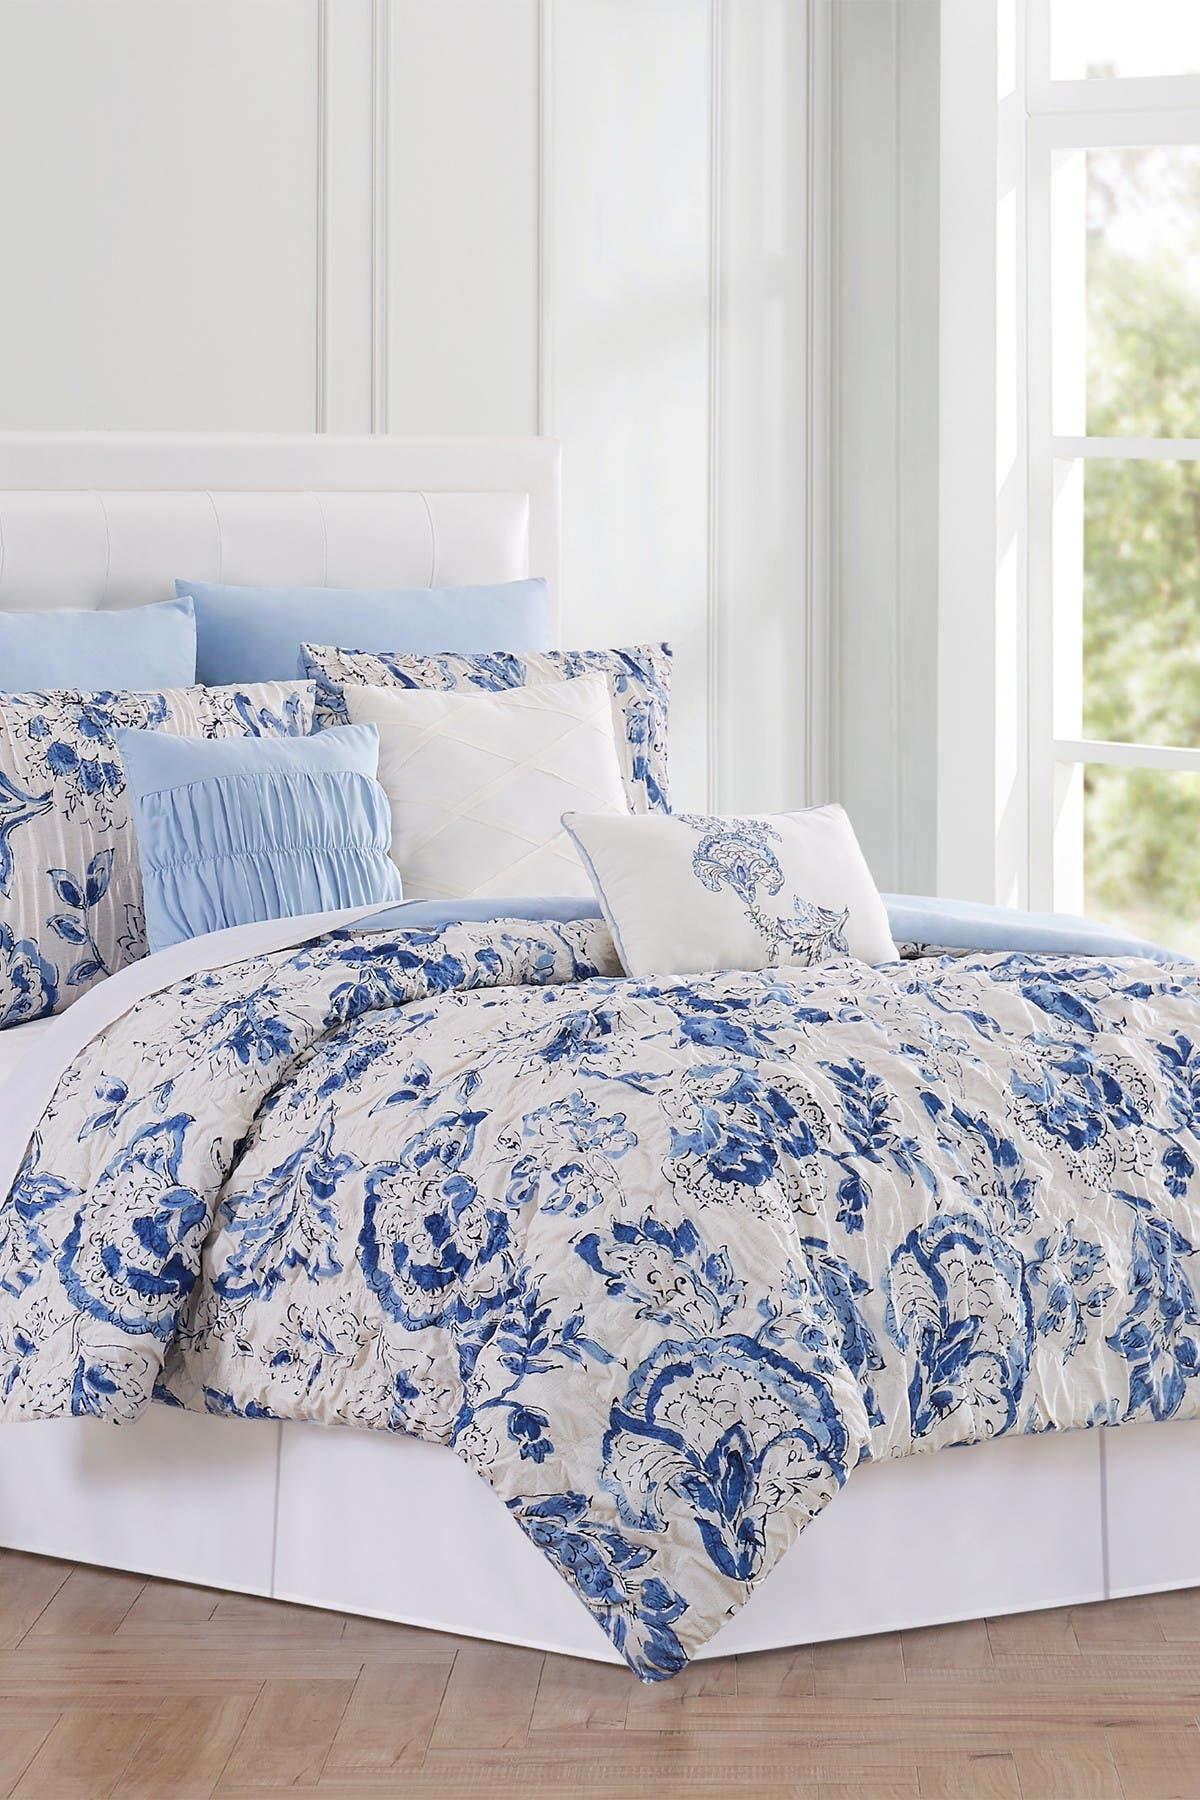 Image of Modern Threads 8-Piece Fashion Comforter Set - Ines - Queen